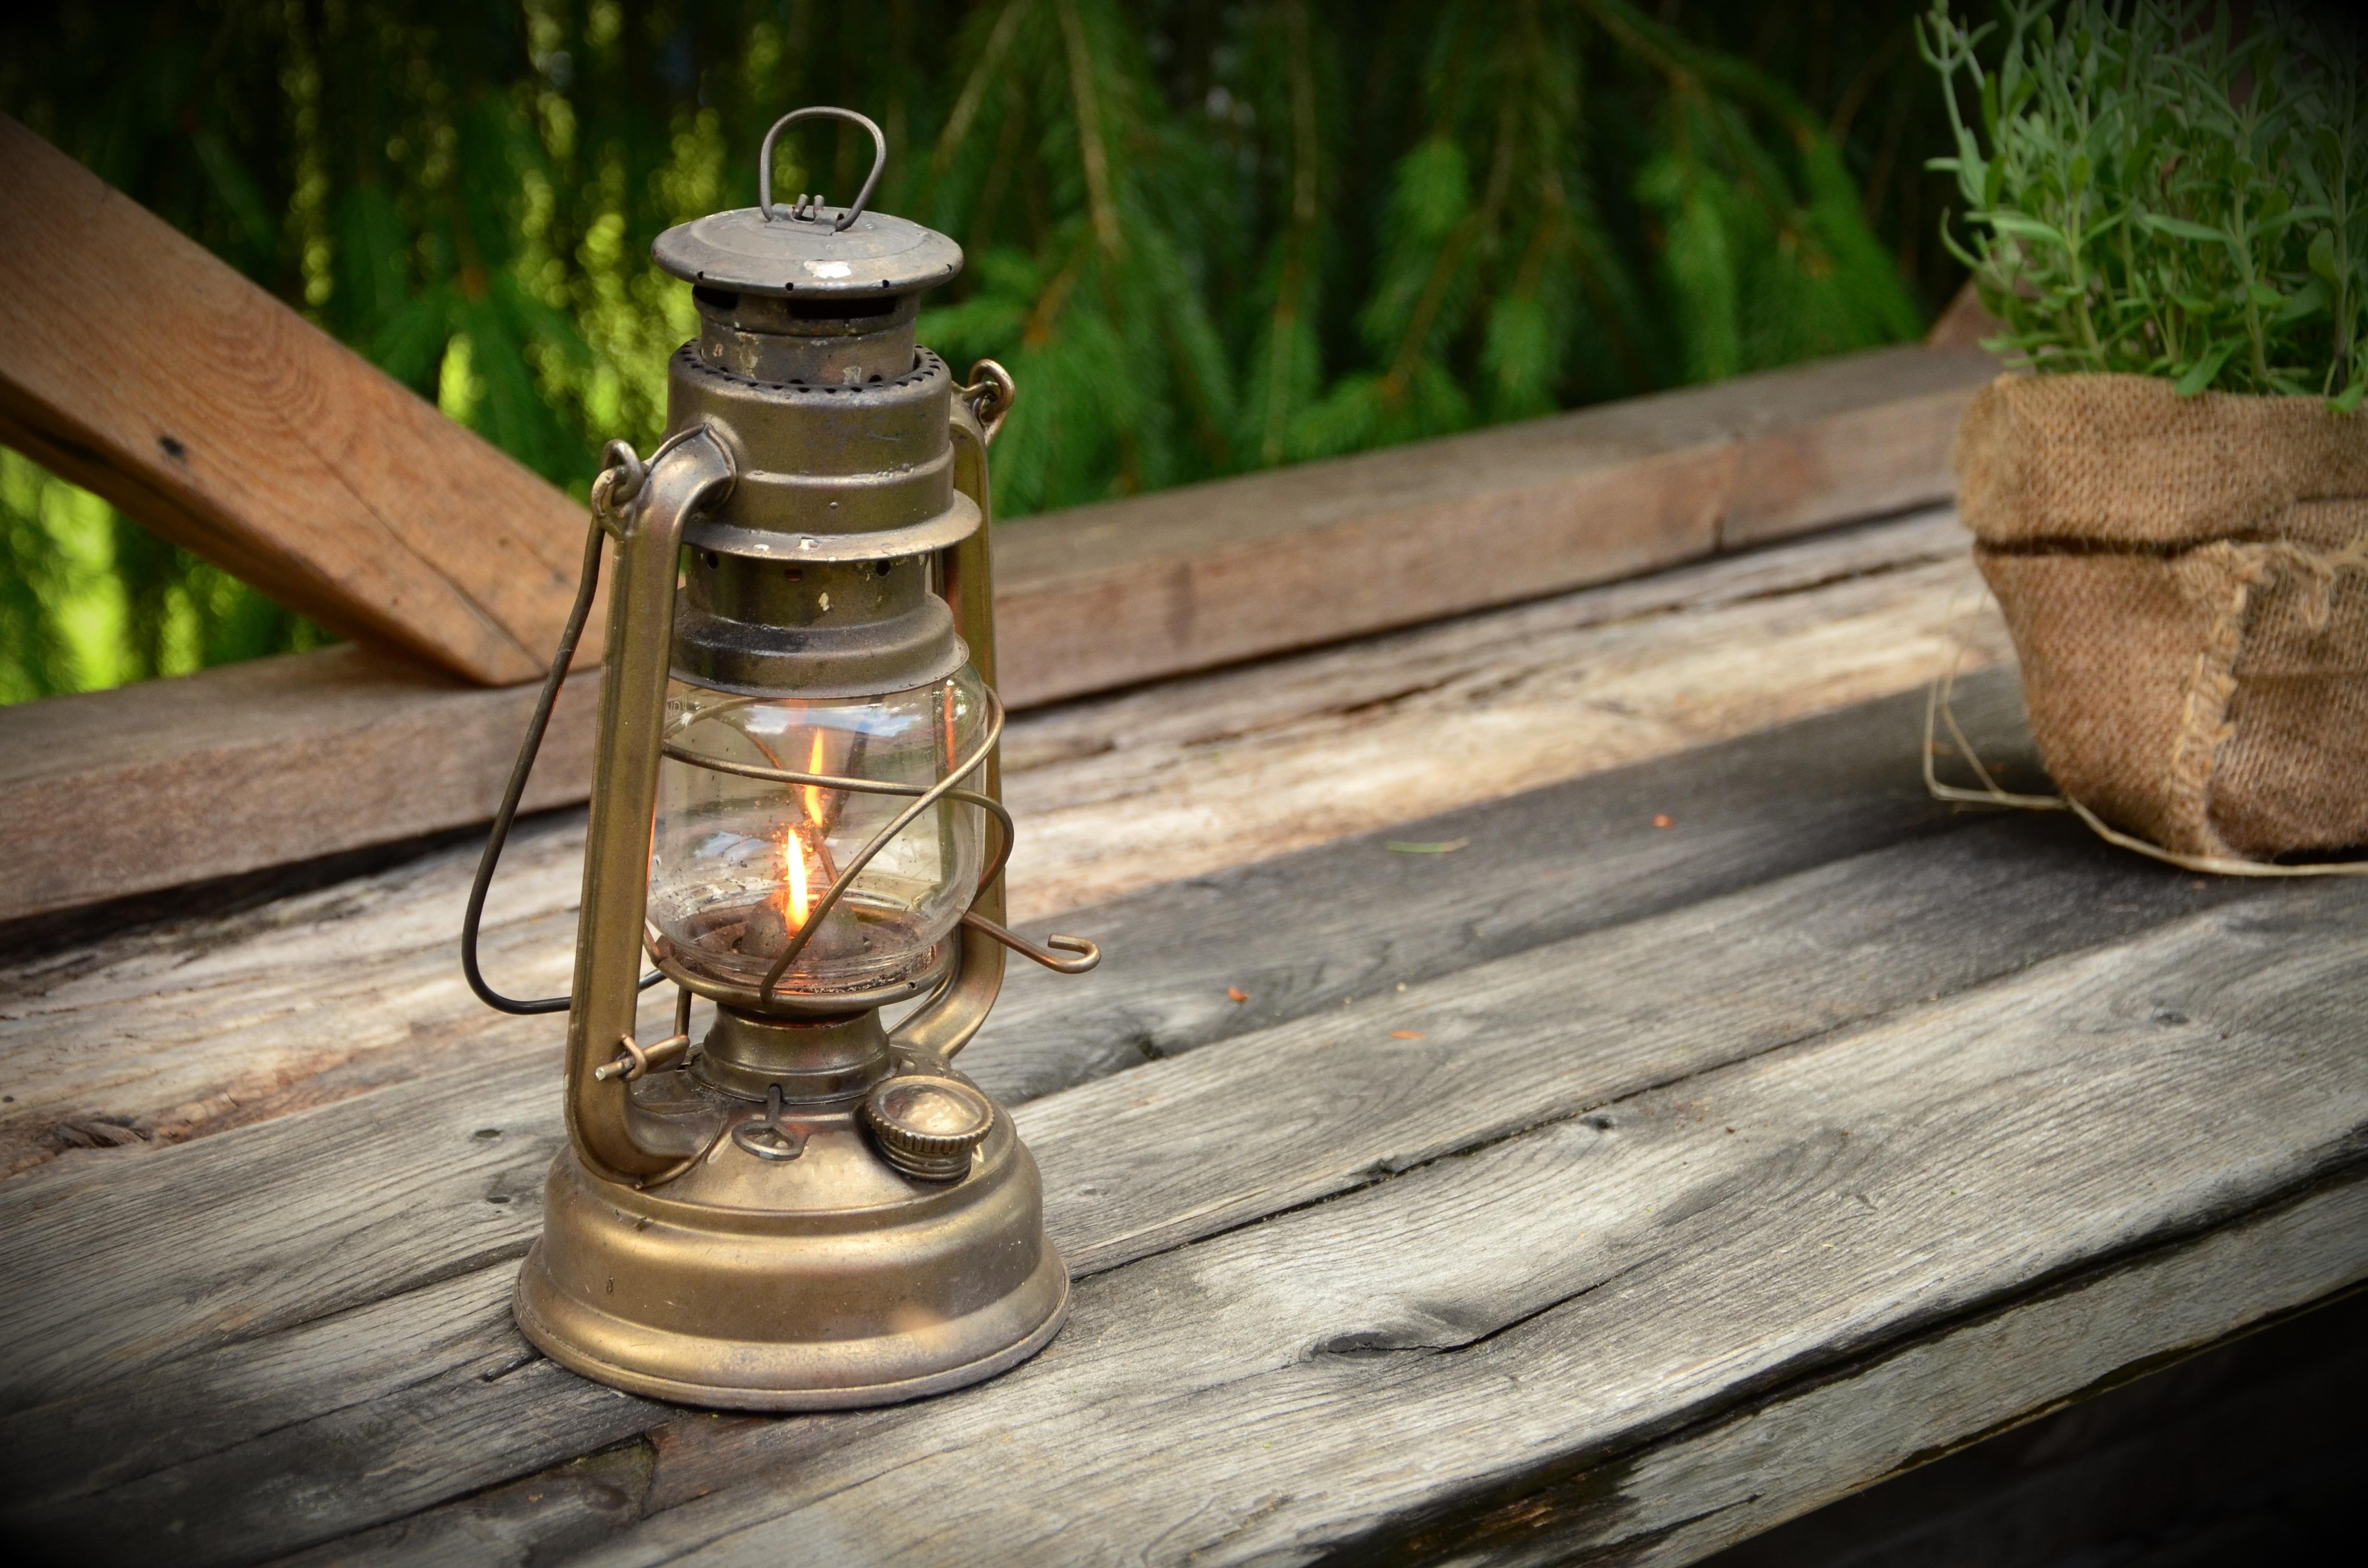 Decorative Outdoor Kerosene Lanterns Inside Preferred Free Images : Wood, Decoration, Lantern, Metal, Garden, Lighting (View 10 of 20)